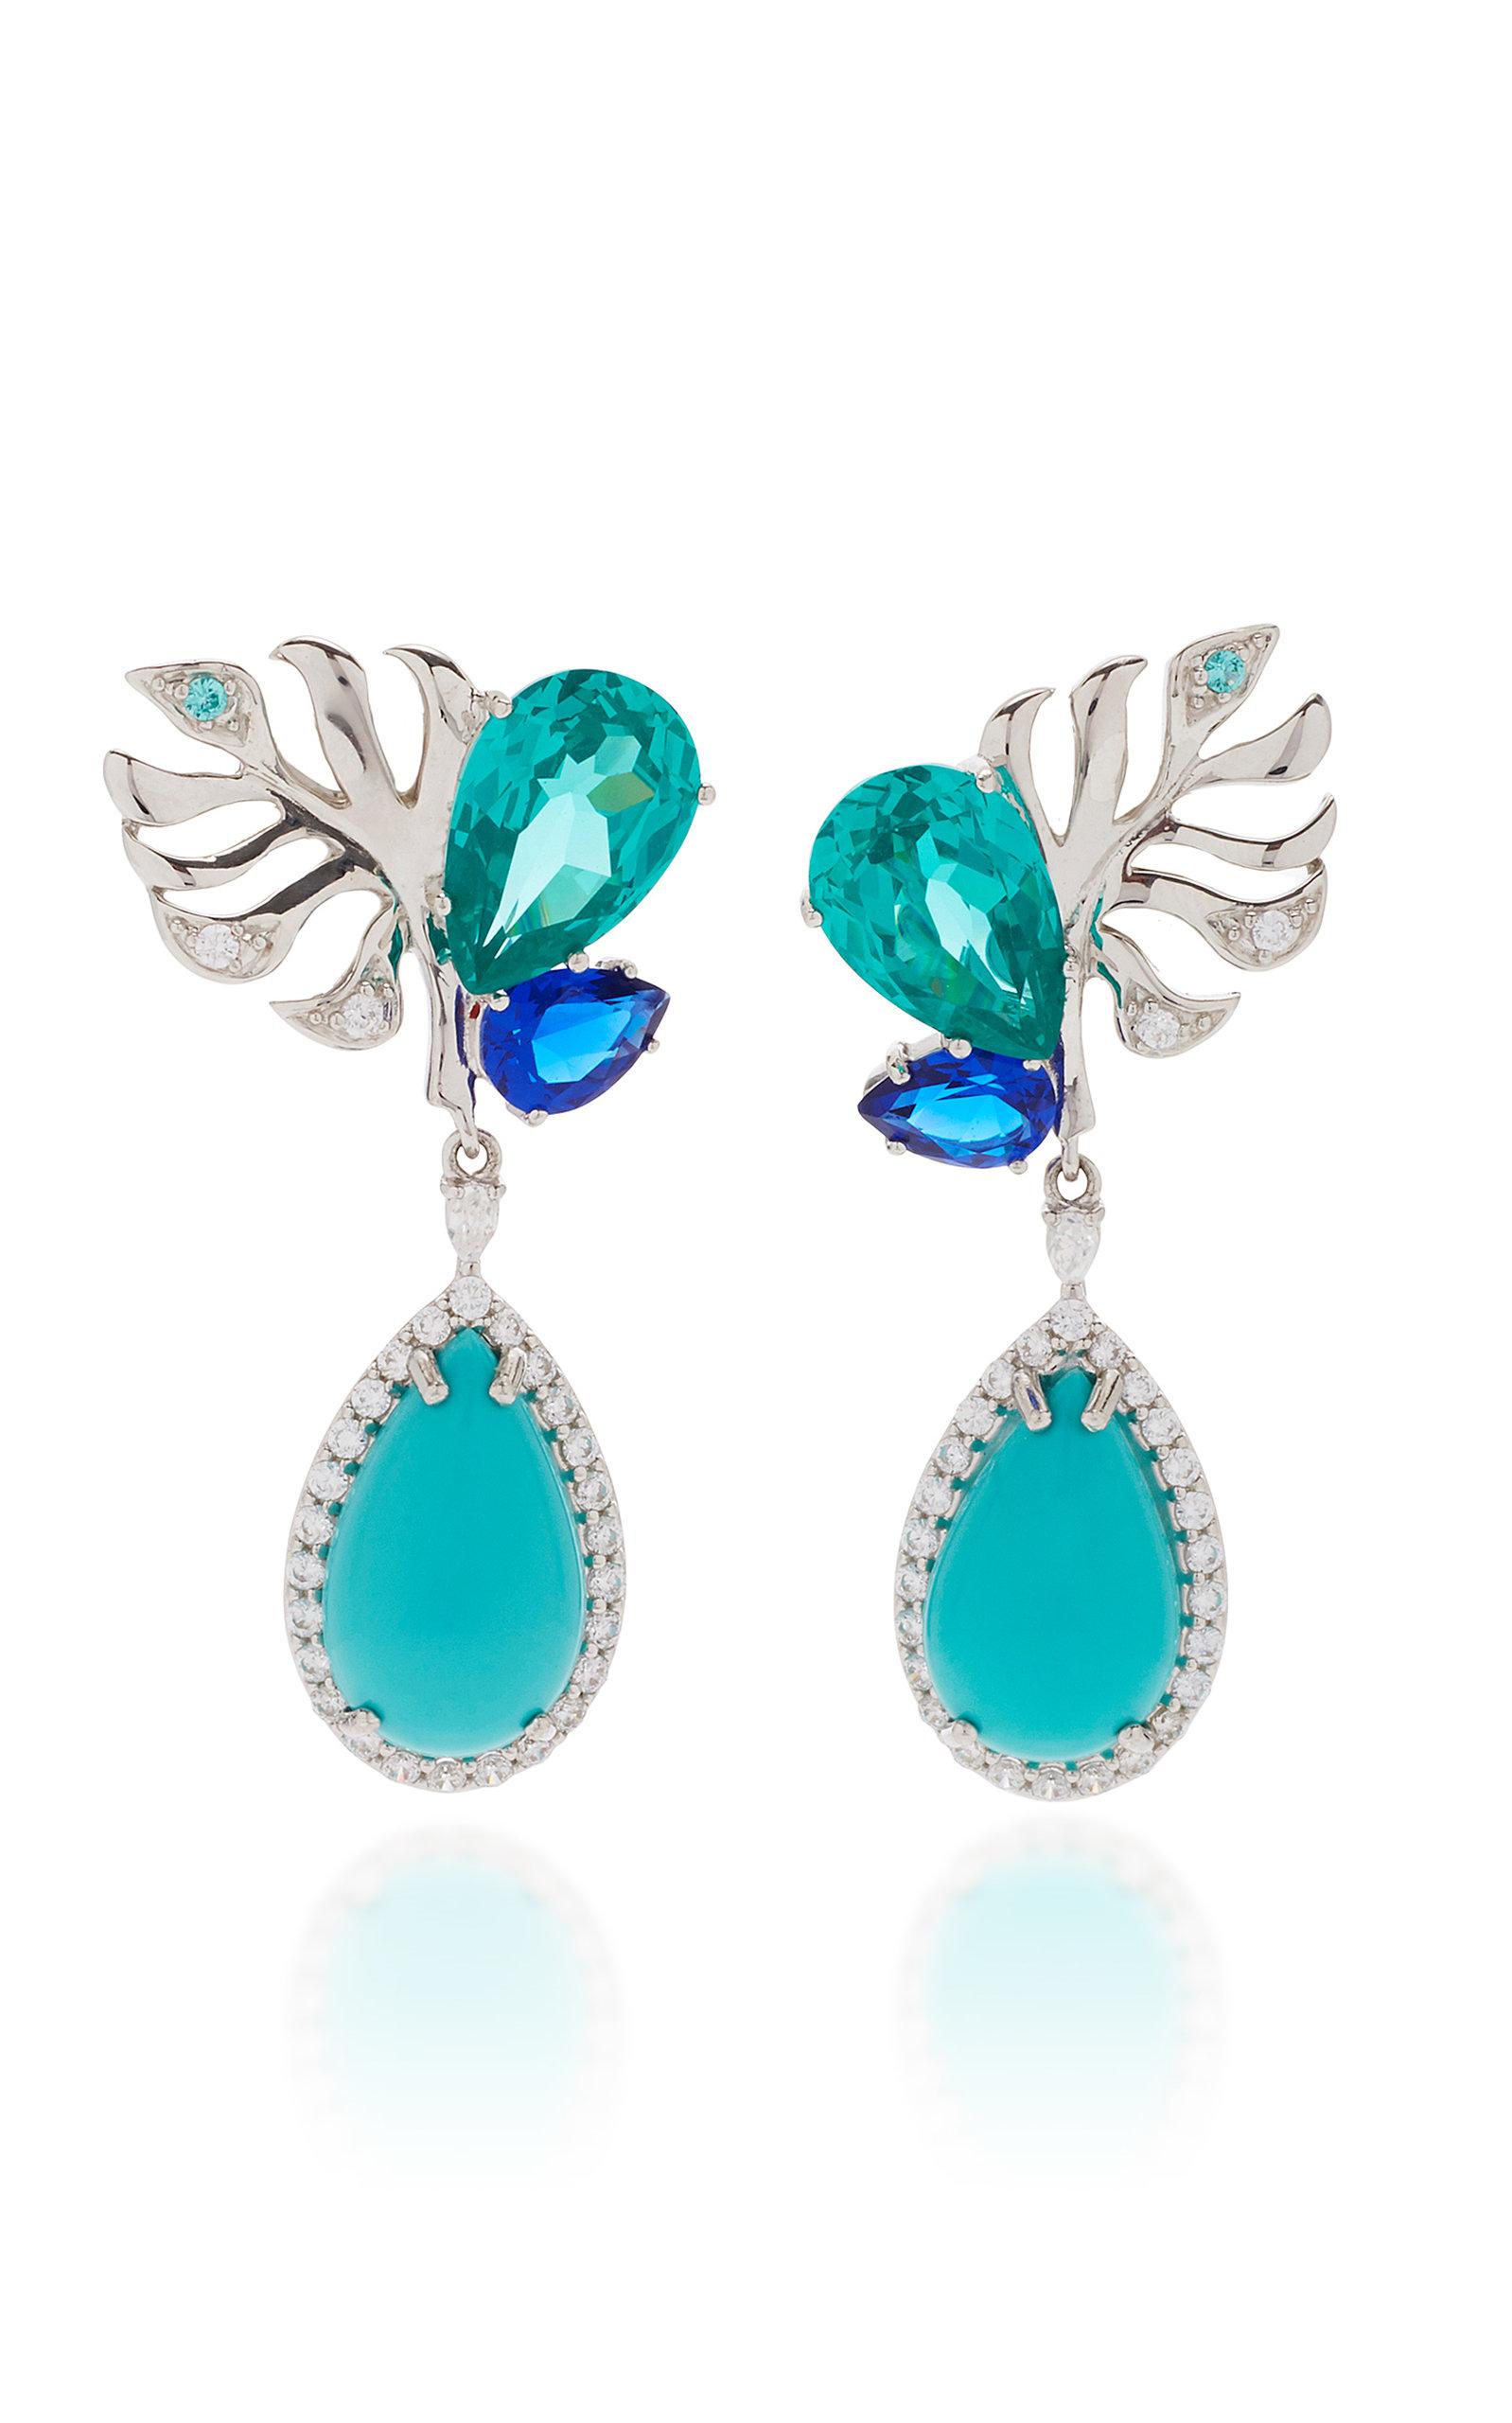 Women's Exclusive Palm 18K White Gold Multi-Stone EarringsÂ